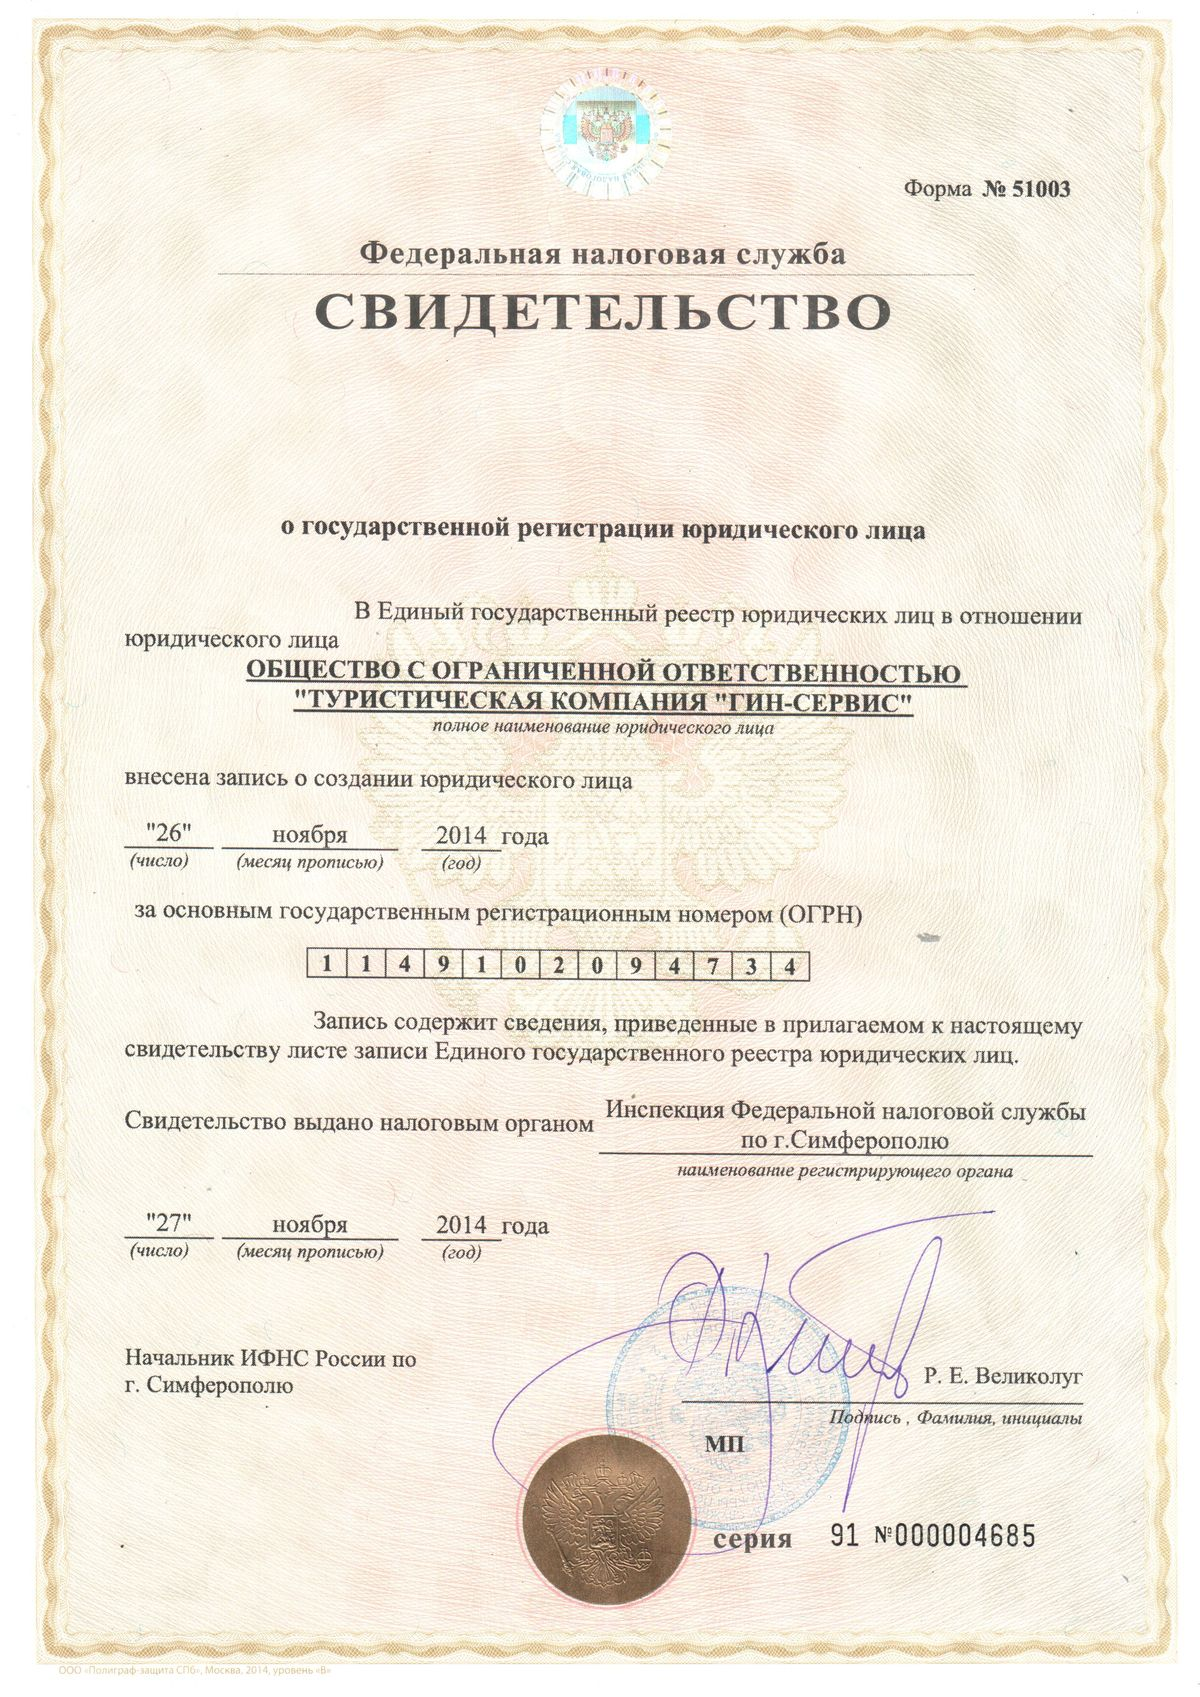 Свидетельство о регистрации ГИН-Сервис